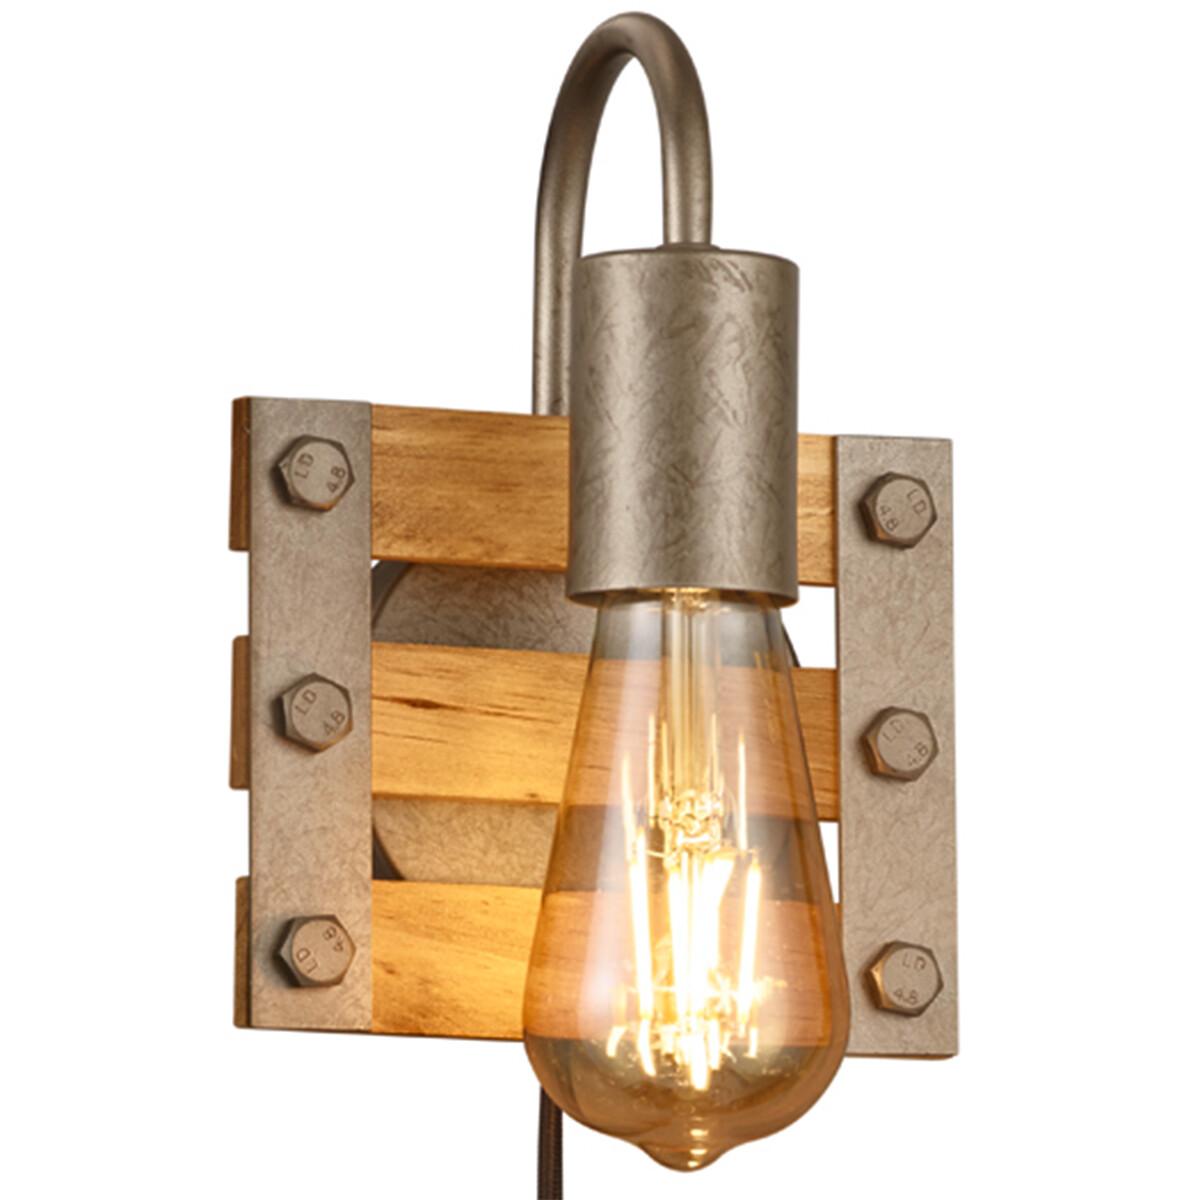 LED Wandlamp - Wandverlichting - Trion Khon - E27 Fitting - 1-lichts - Vierkant - Mat Nikkel - Alumi